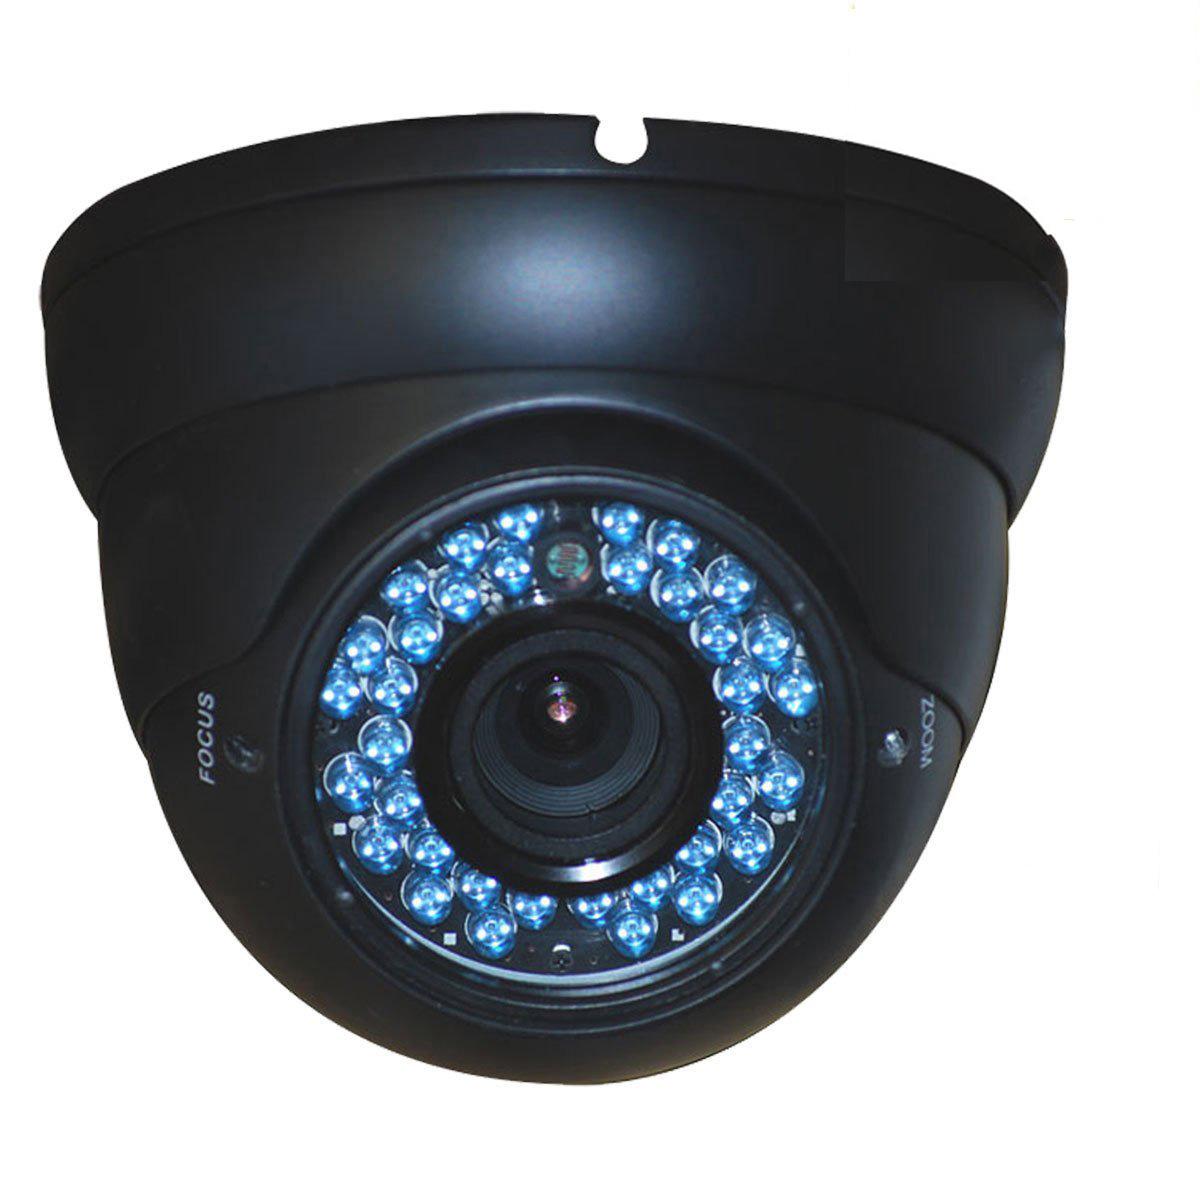 VideoSecu Outdoor CCD 4 - 9mm Varifocal Lens IR Day Night Vision Security